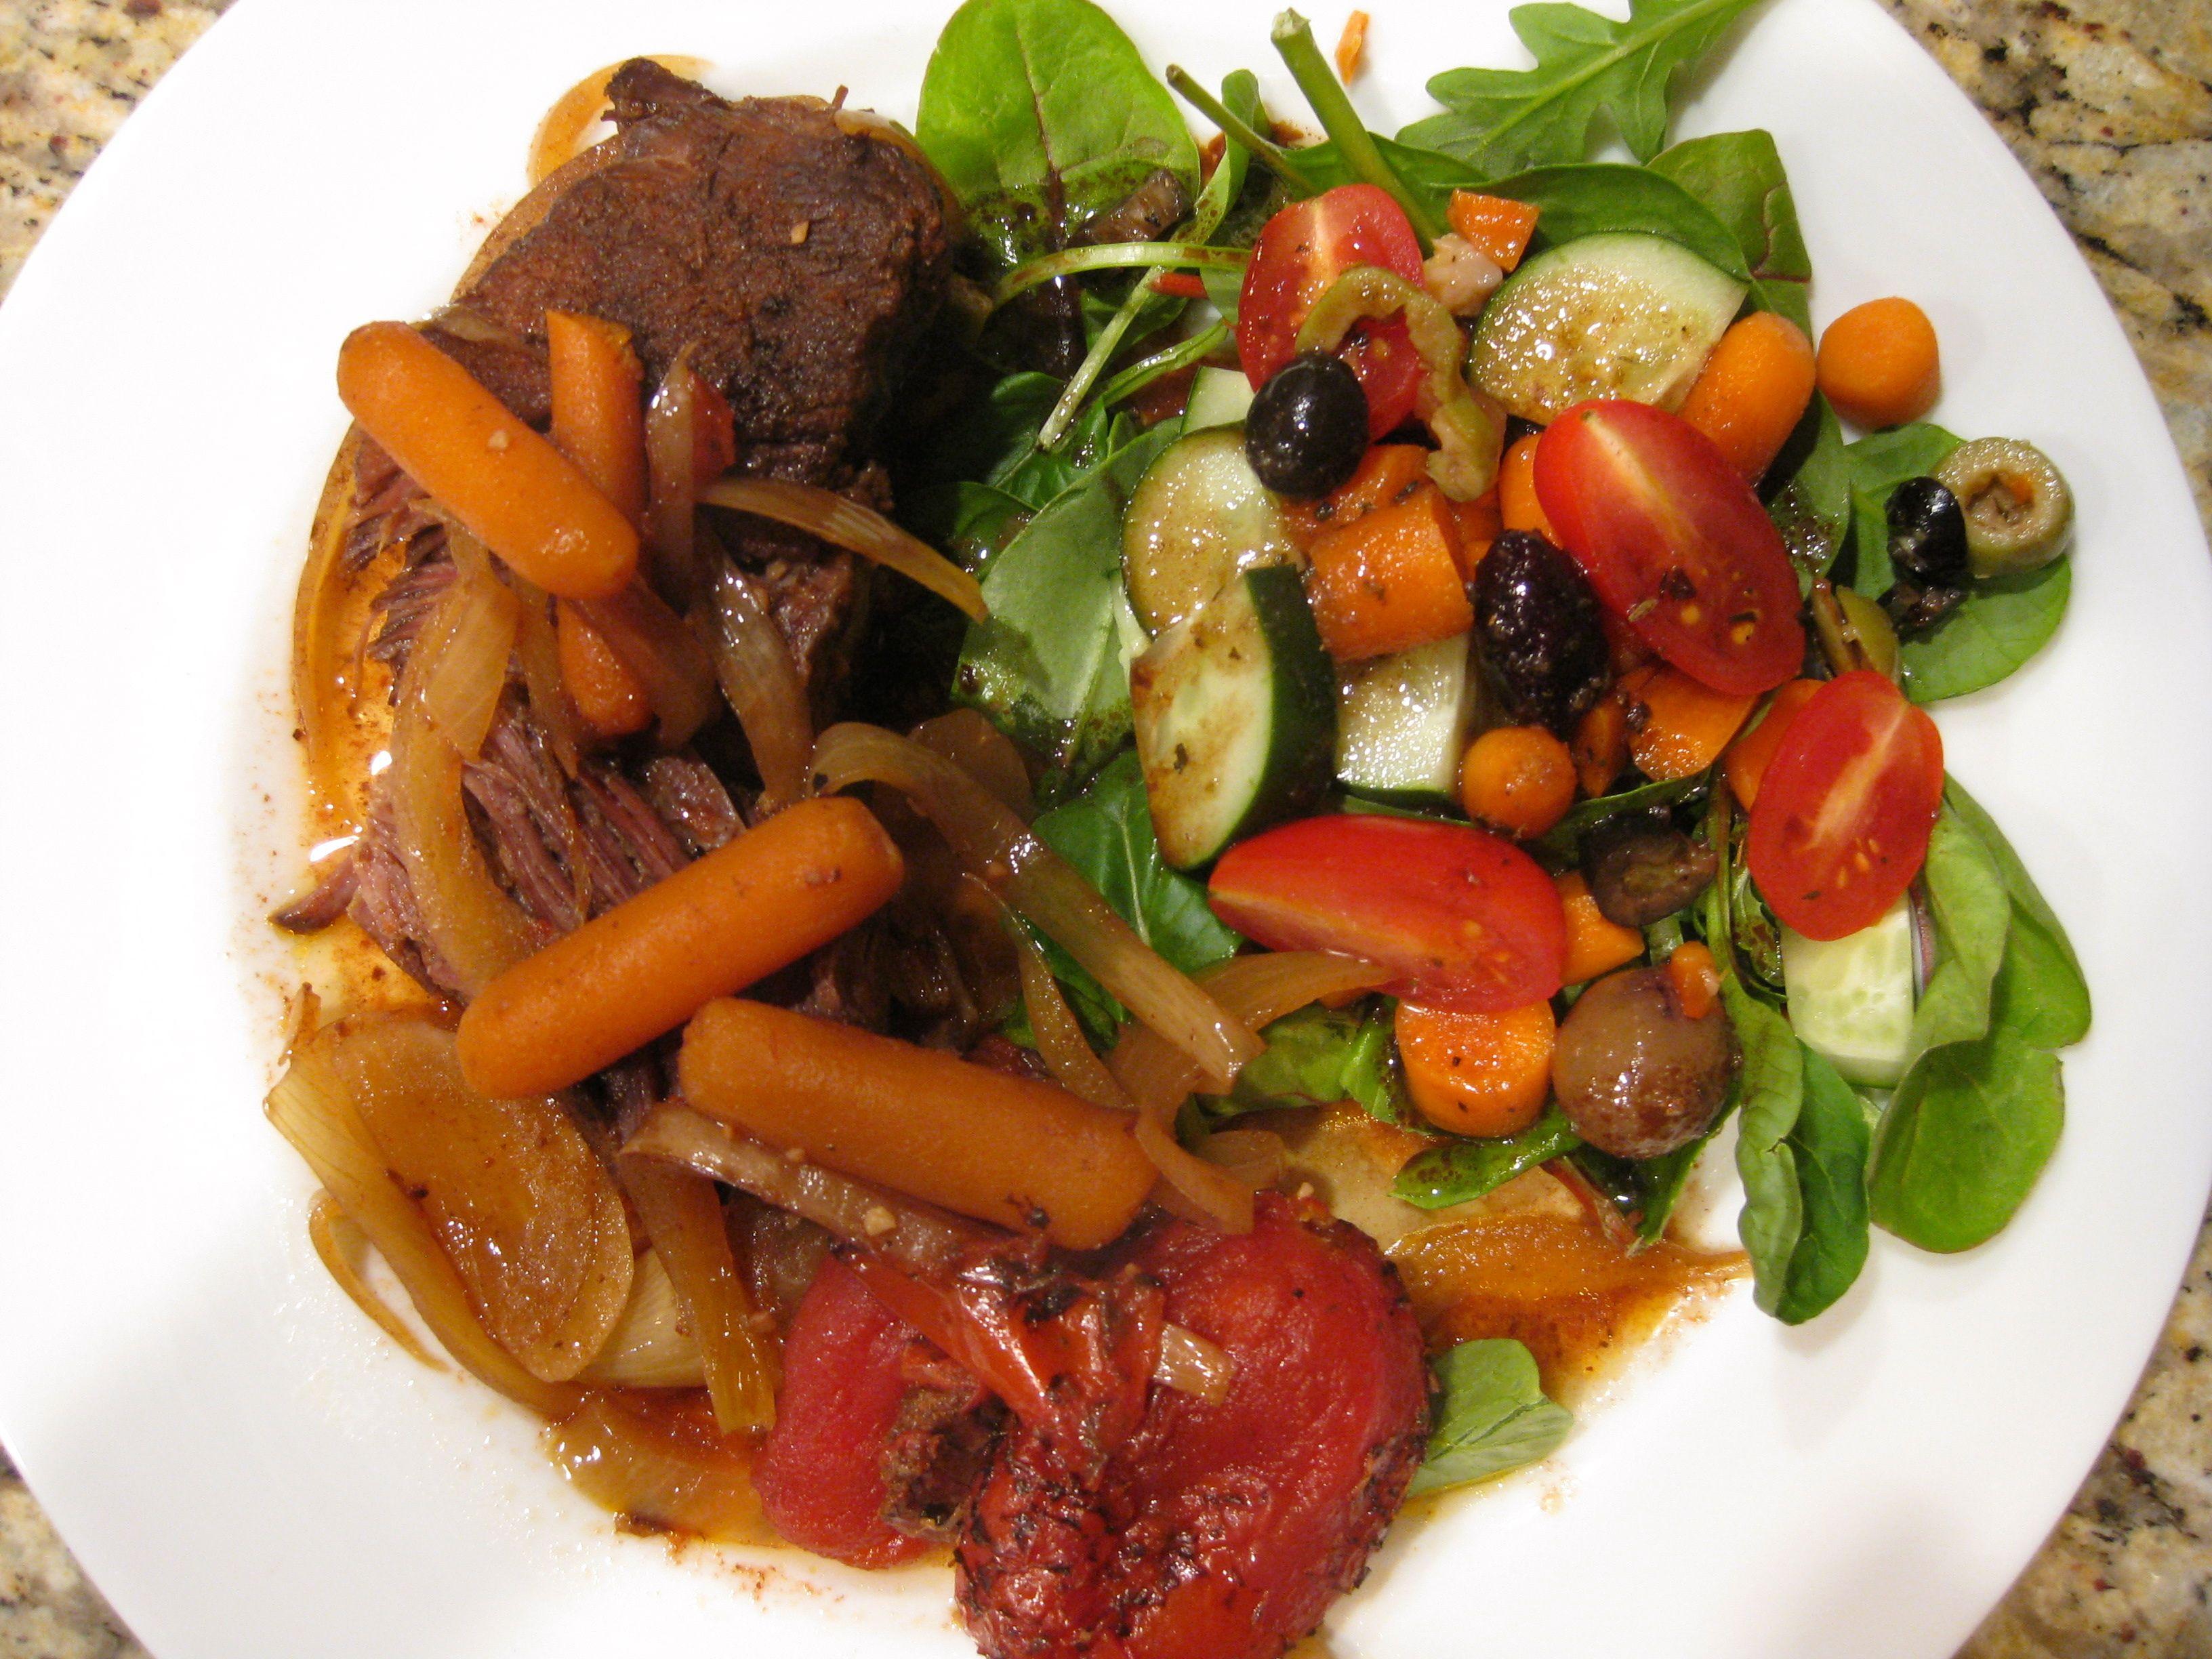 Balsamic tomato pot roast pot roast dinner low carb meats